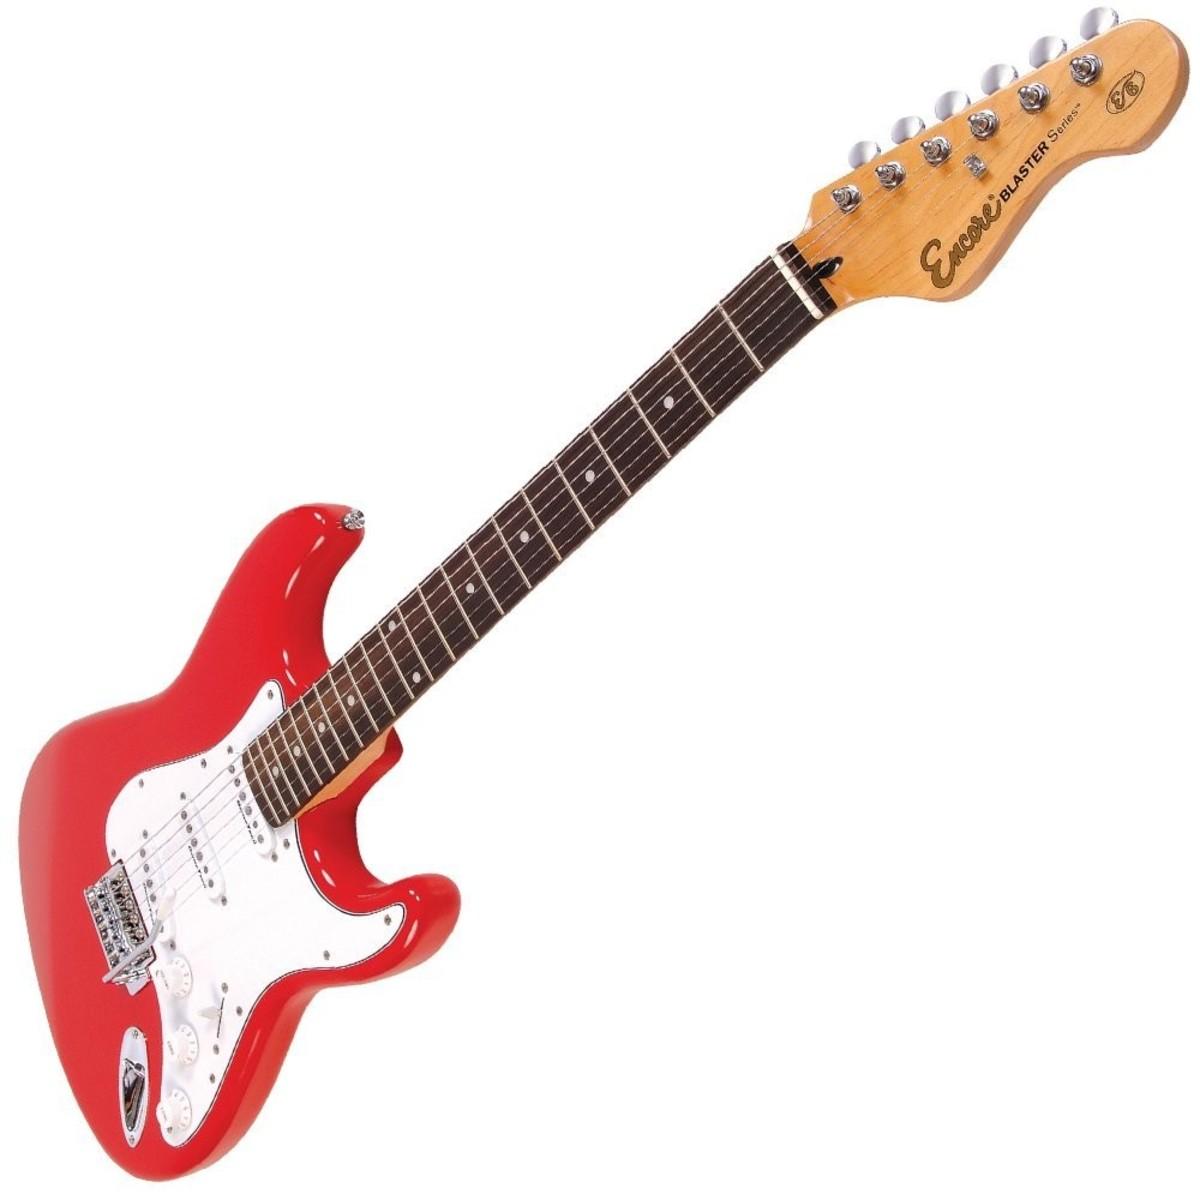 encore e6 electric guitar red at. Black Bedroom Furniture Sets. Home Design Ideas